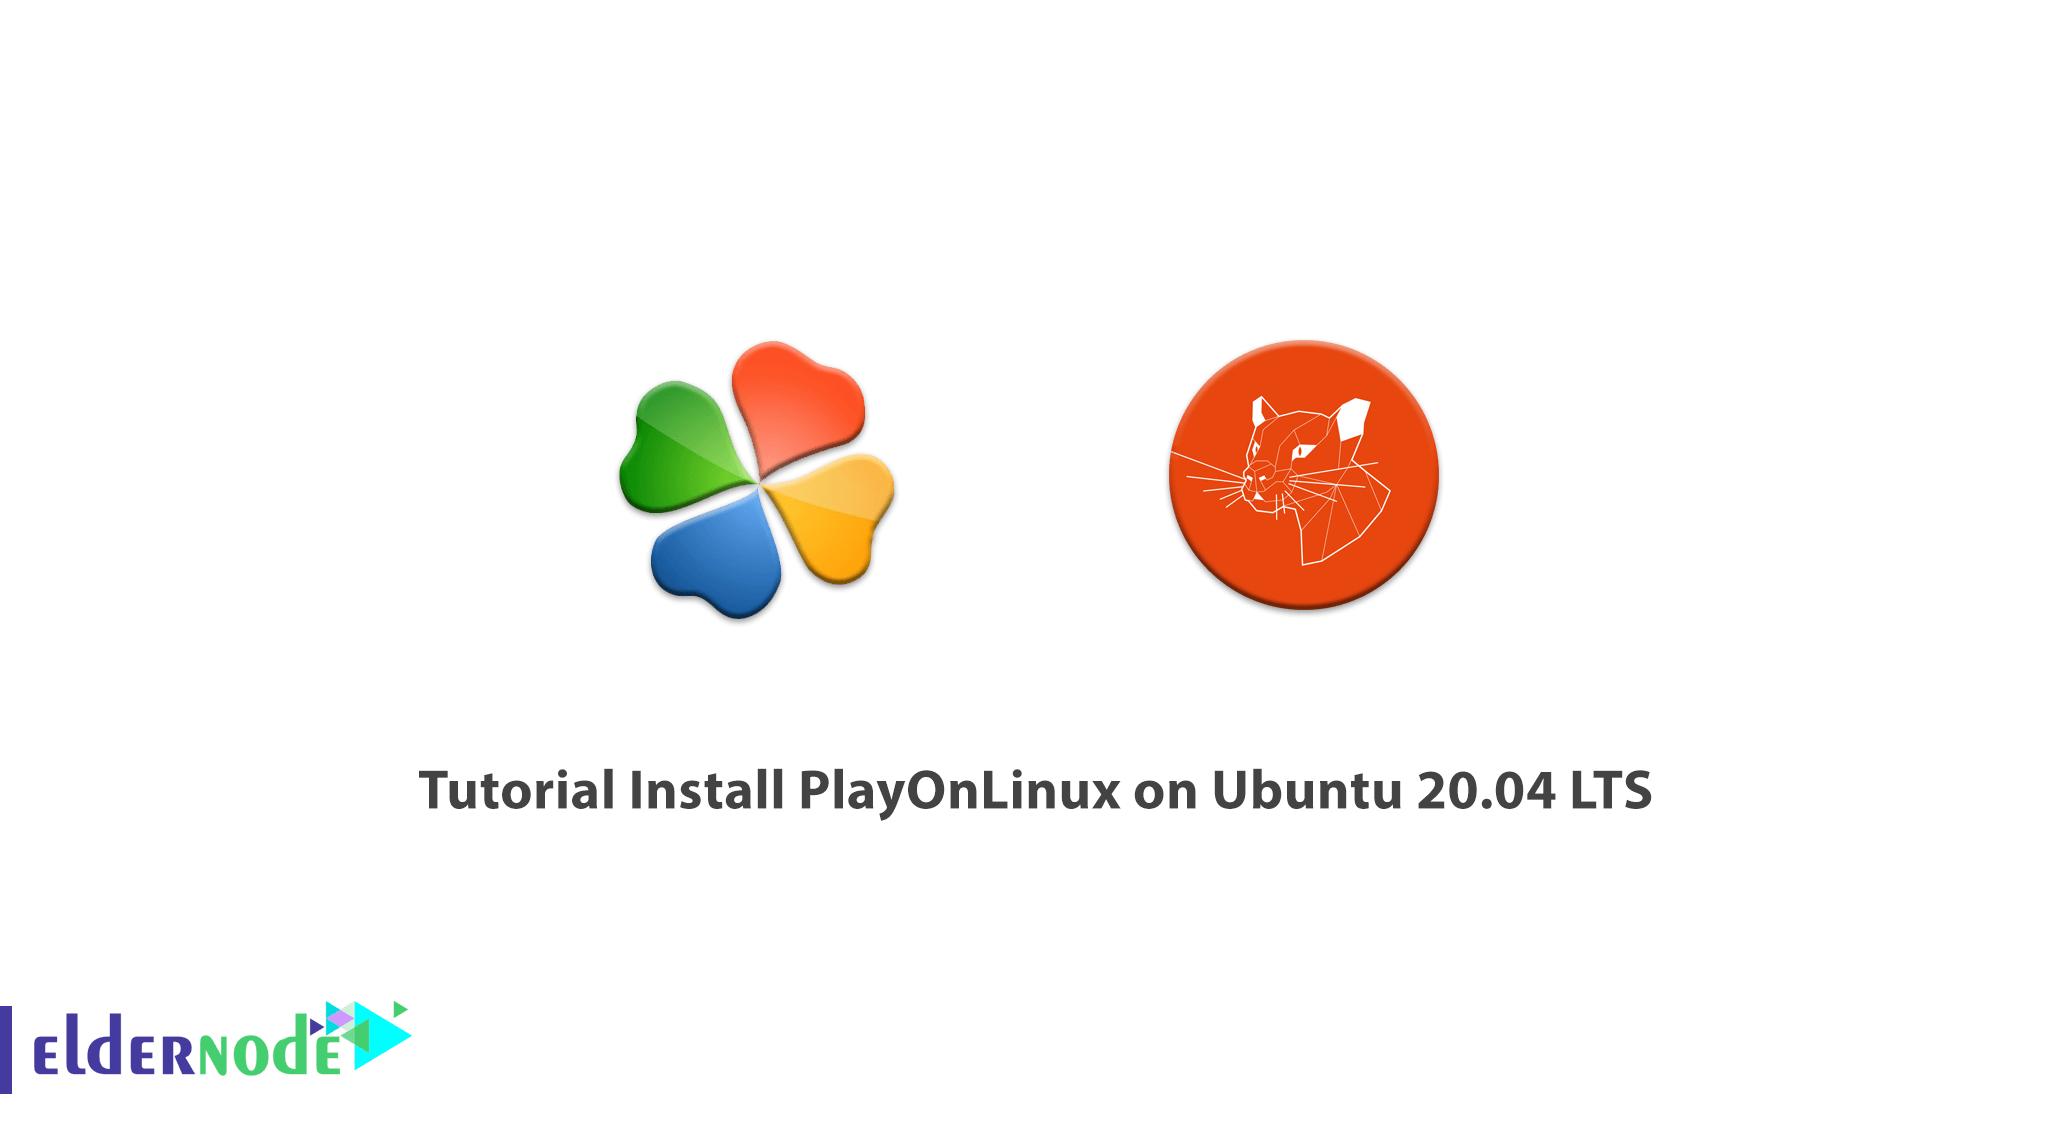 Tutorial Install PlayOnLinux on Ubuntu 20.04 LTS